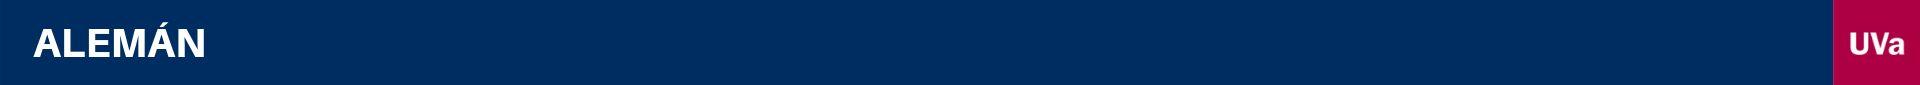 Alemán banner cursos web